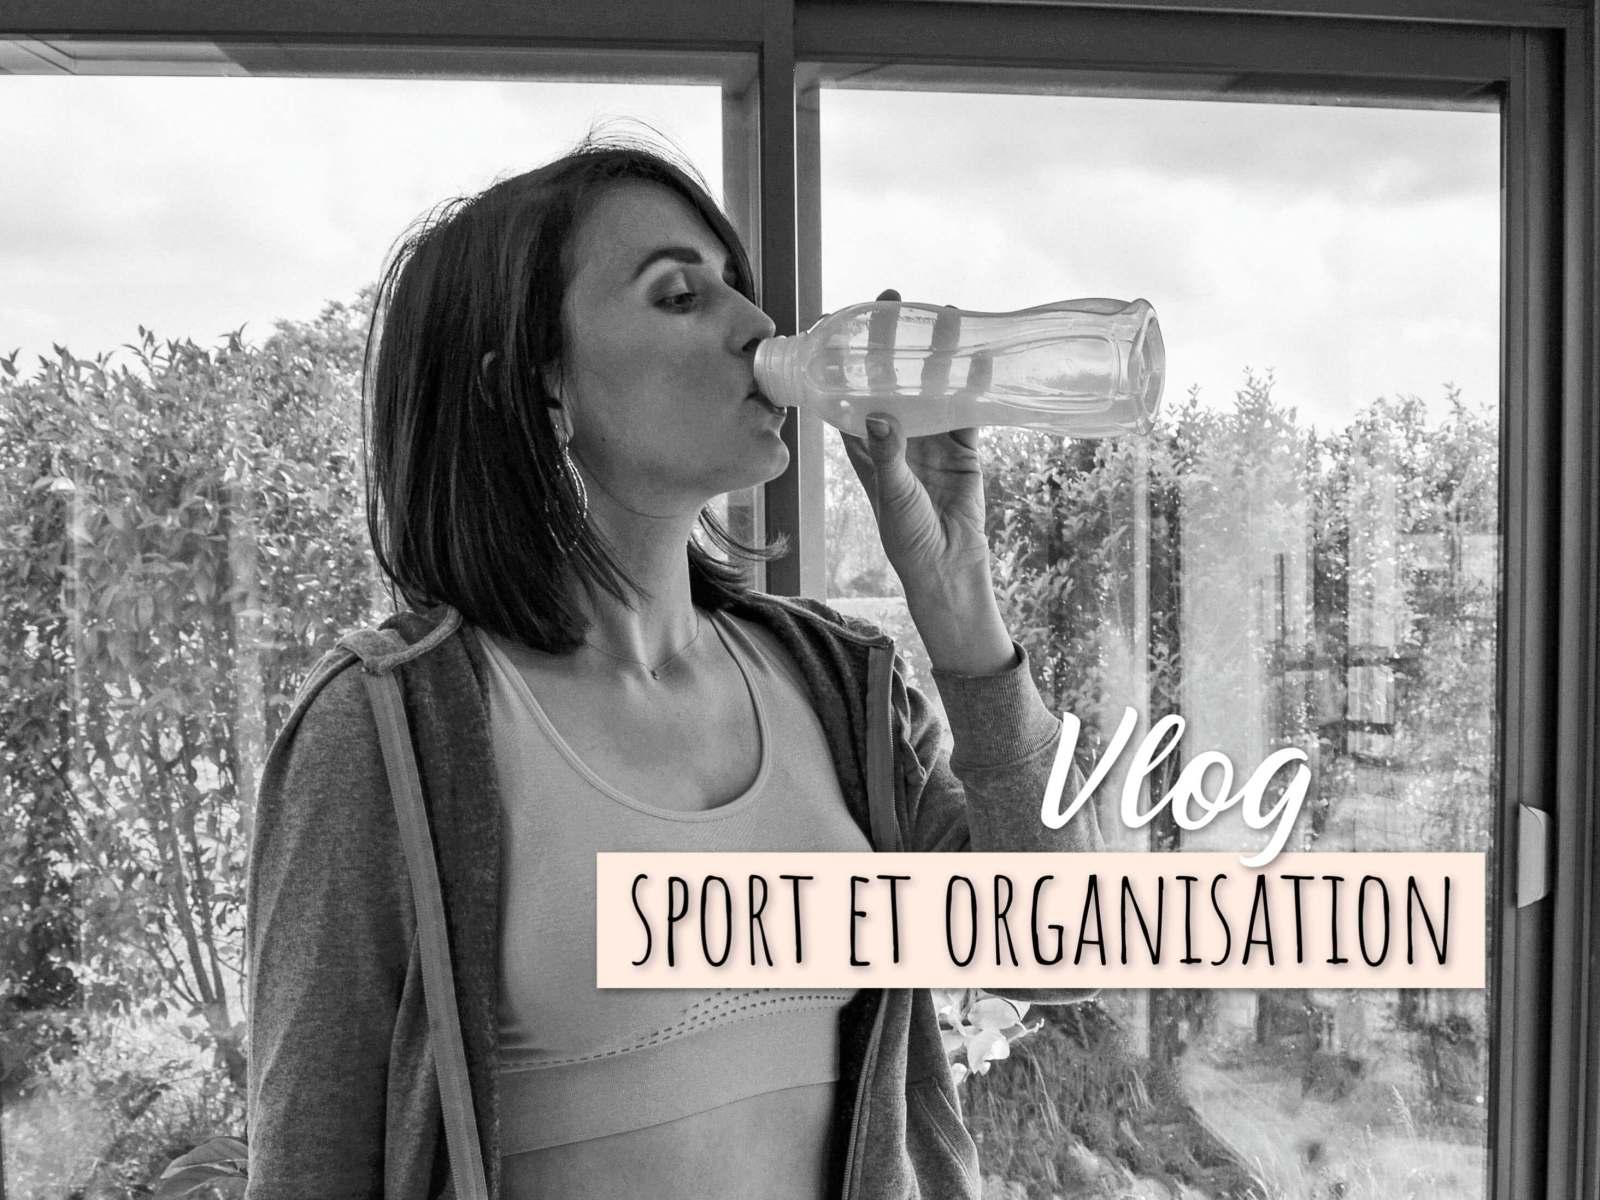 sport et organisation